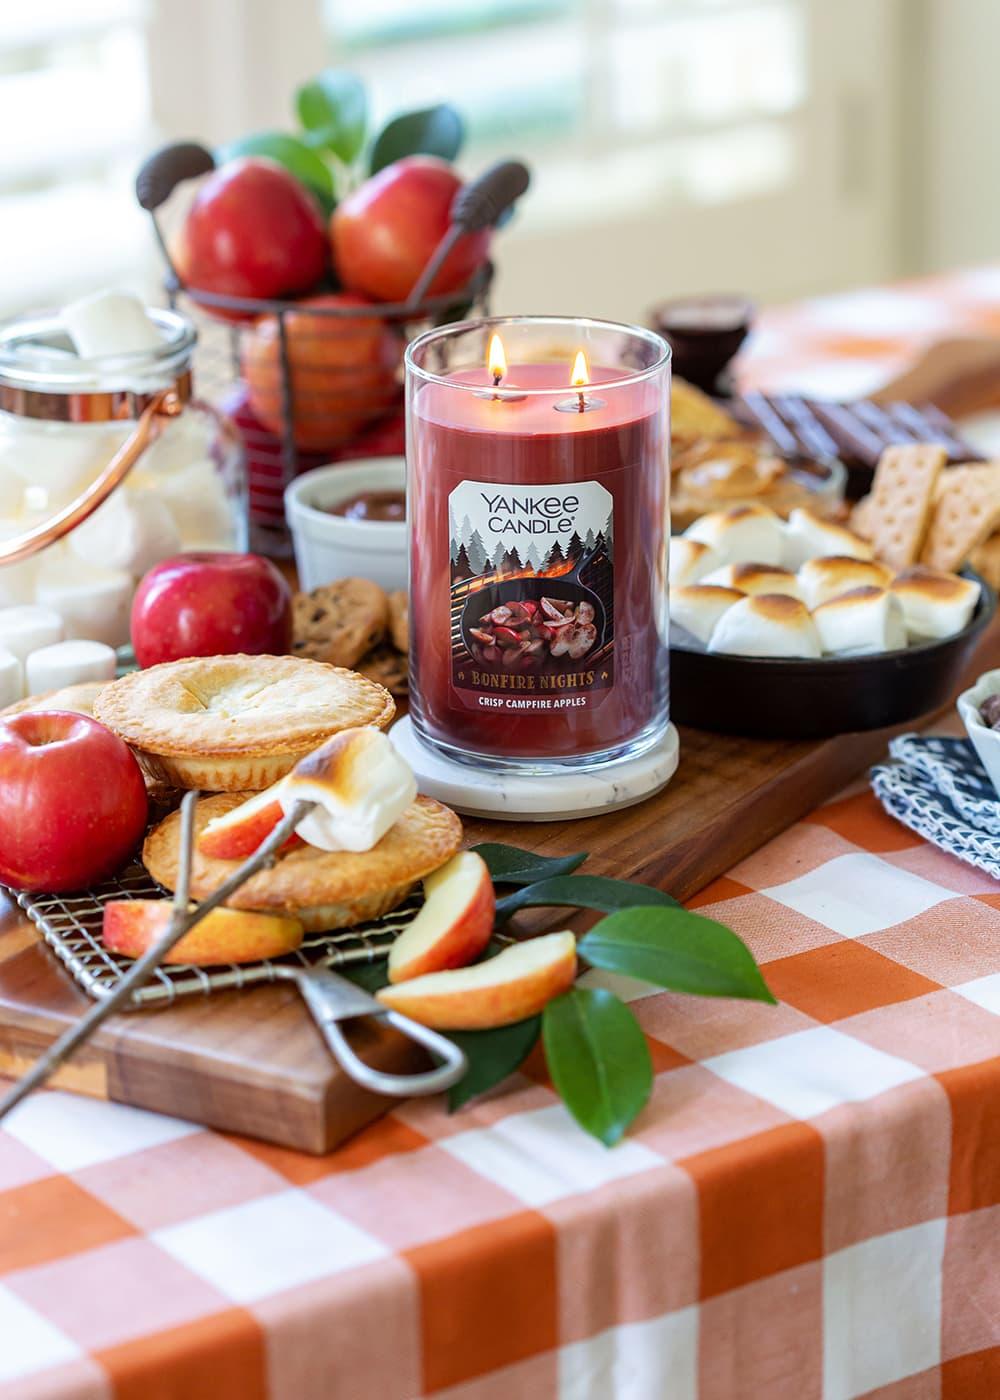 Yankee Candles Bonfire Nights